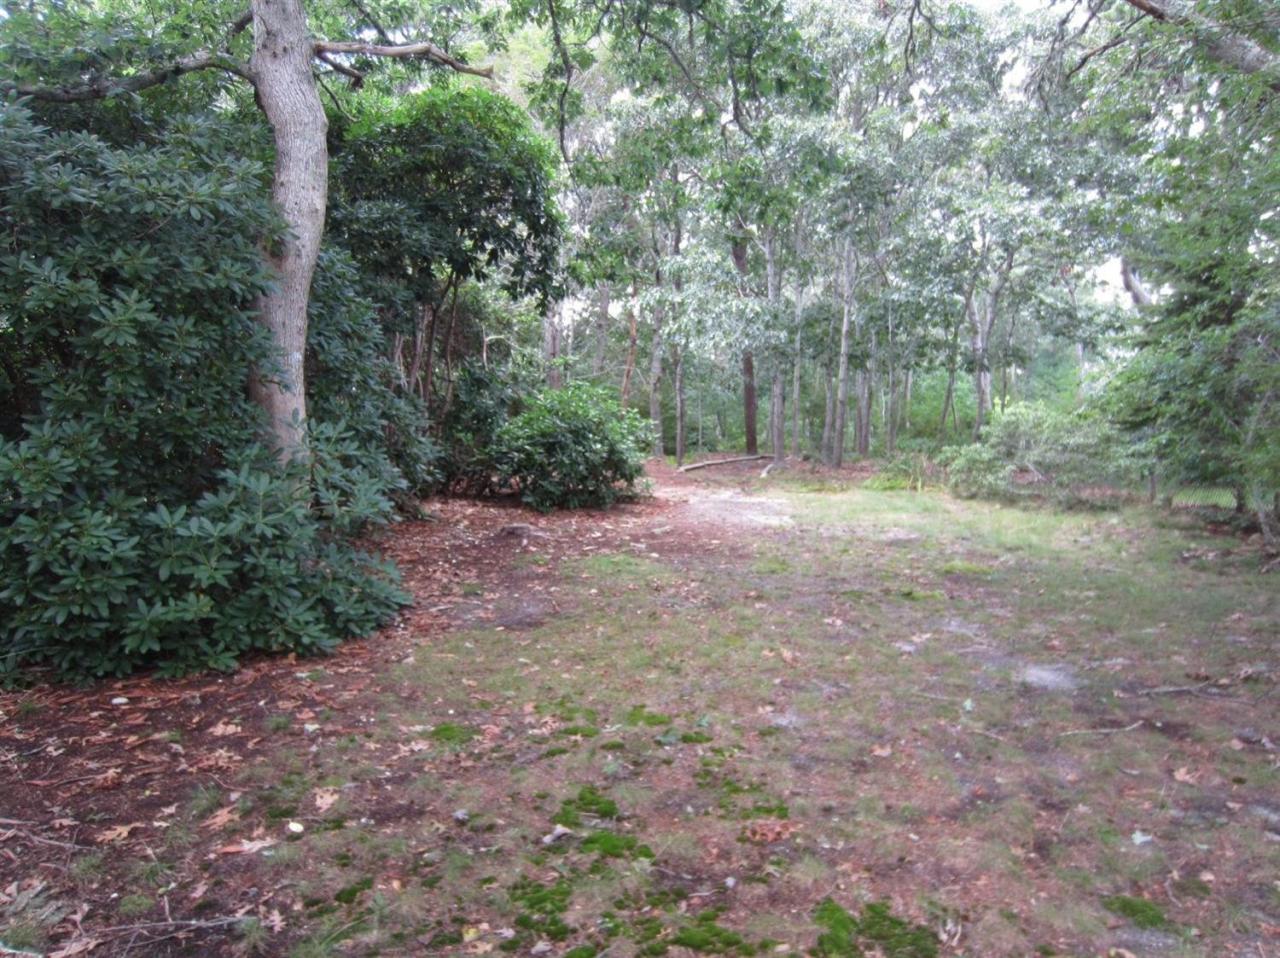 83 Potonumecot Road, Chatham MA, 02633 - slide 31